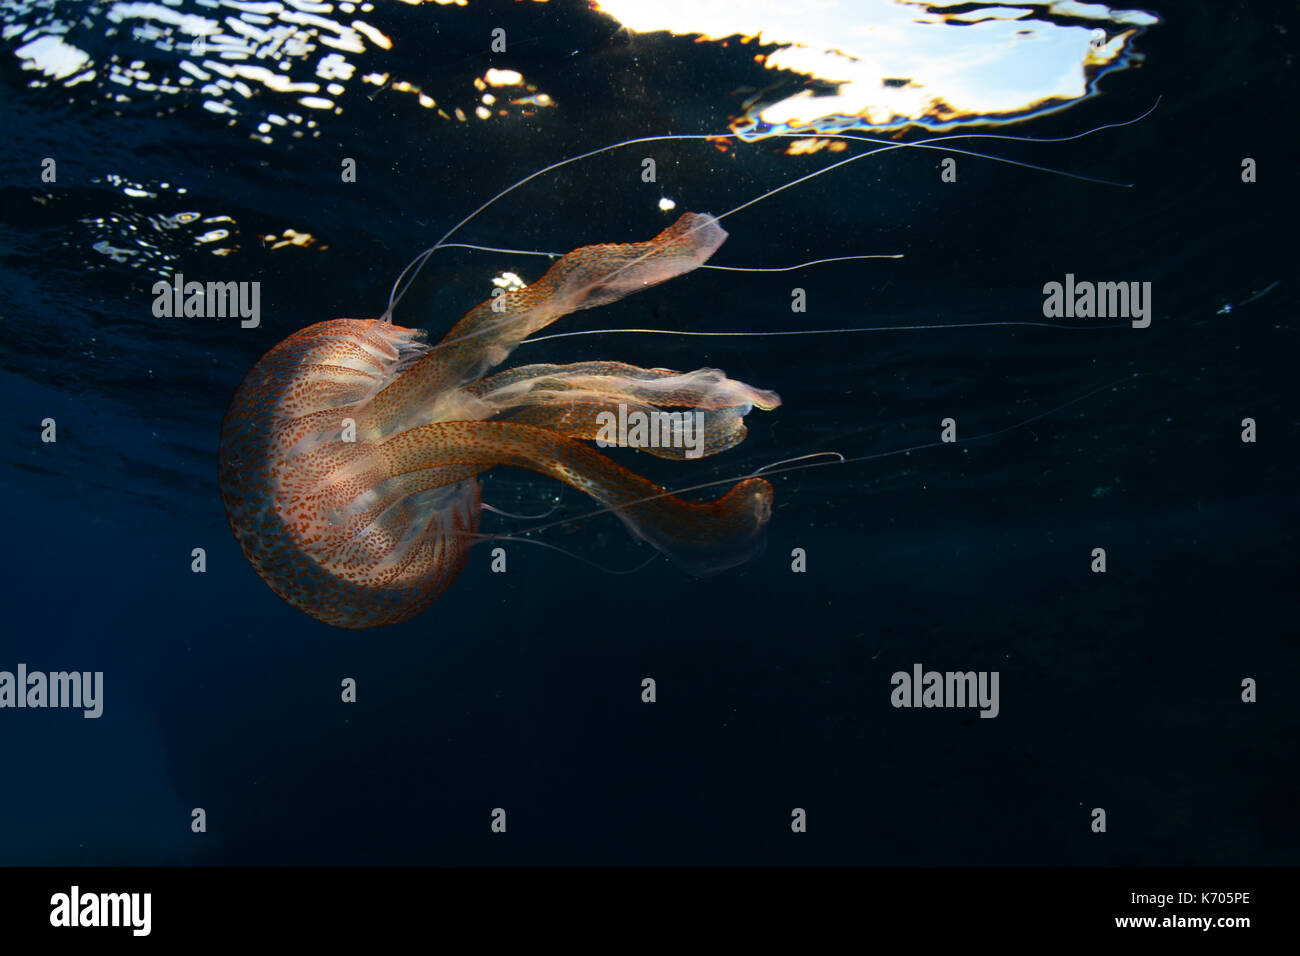 Mauve stinger jellyfish underwater at Cala Balanca, Menorca Stock Photo